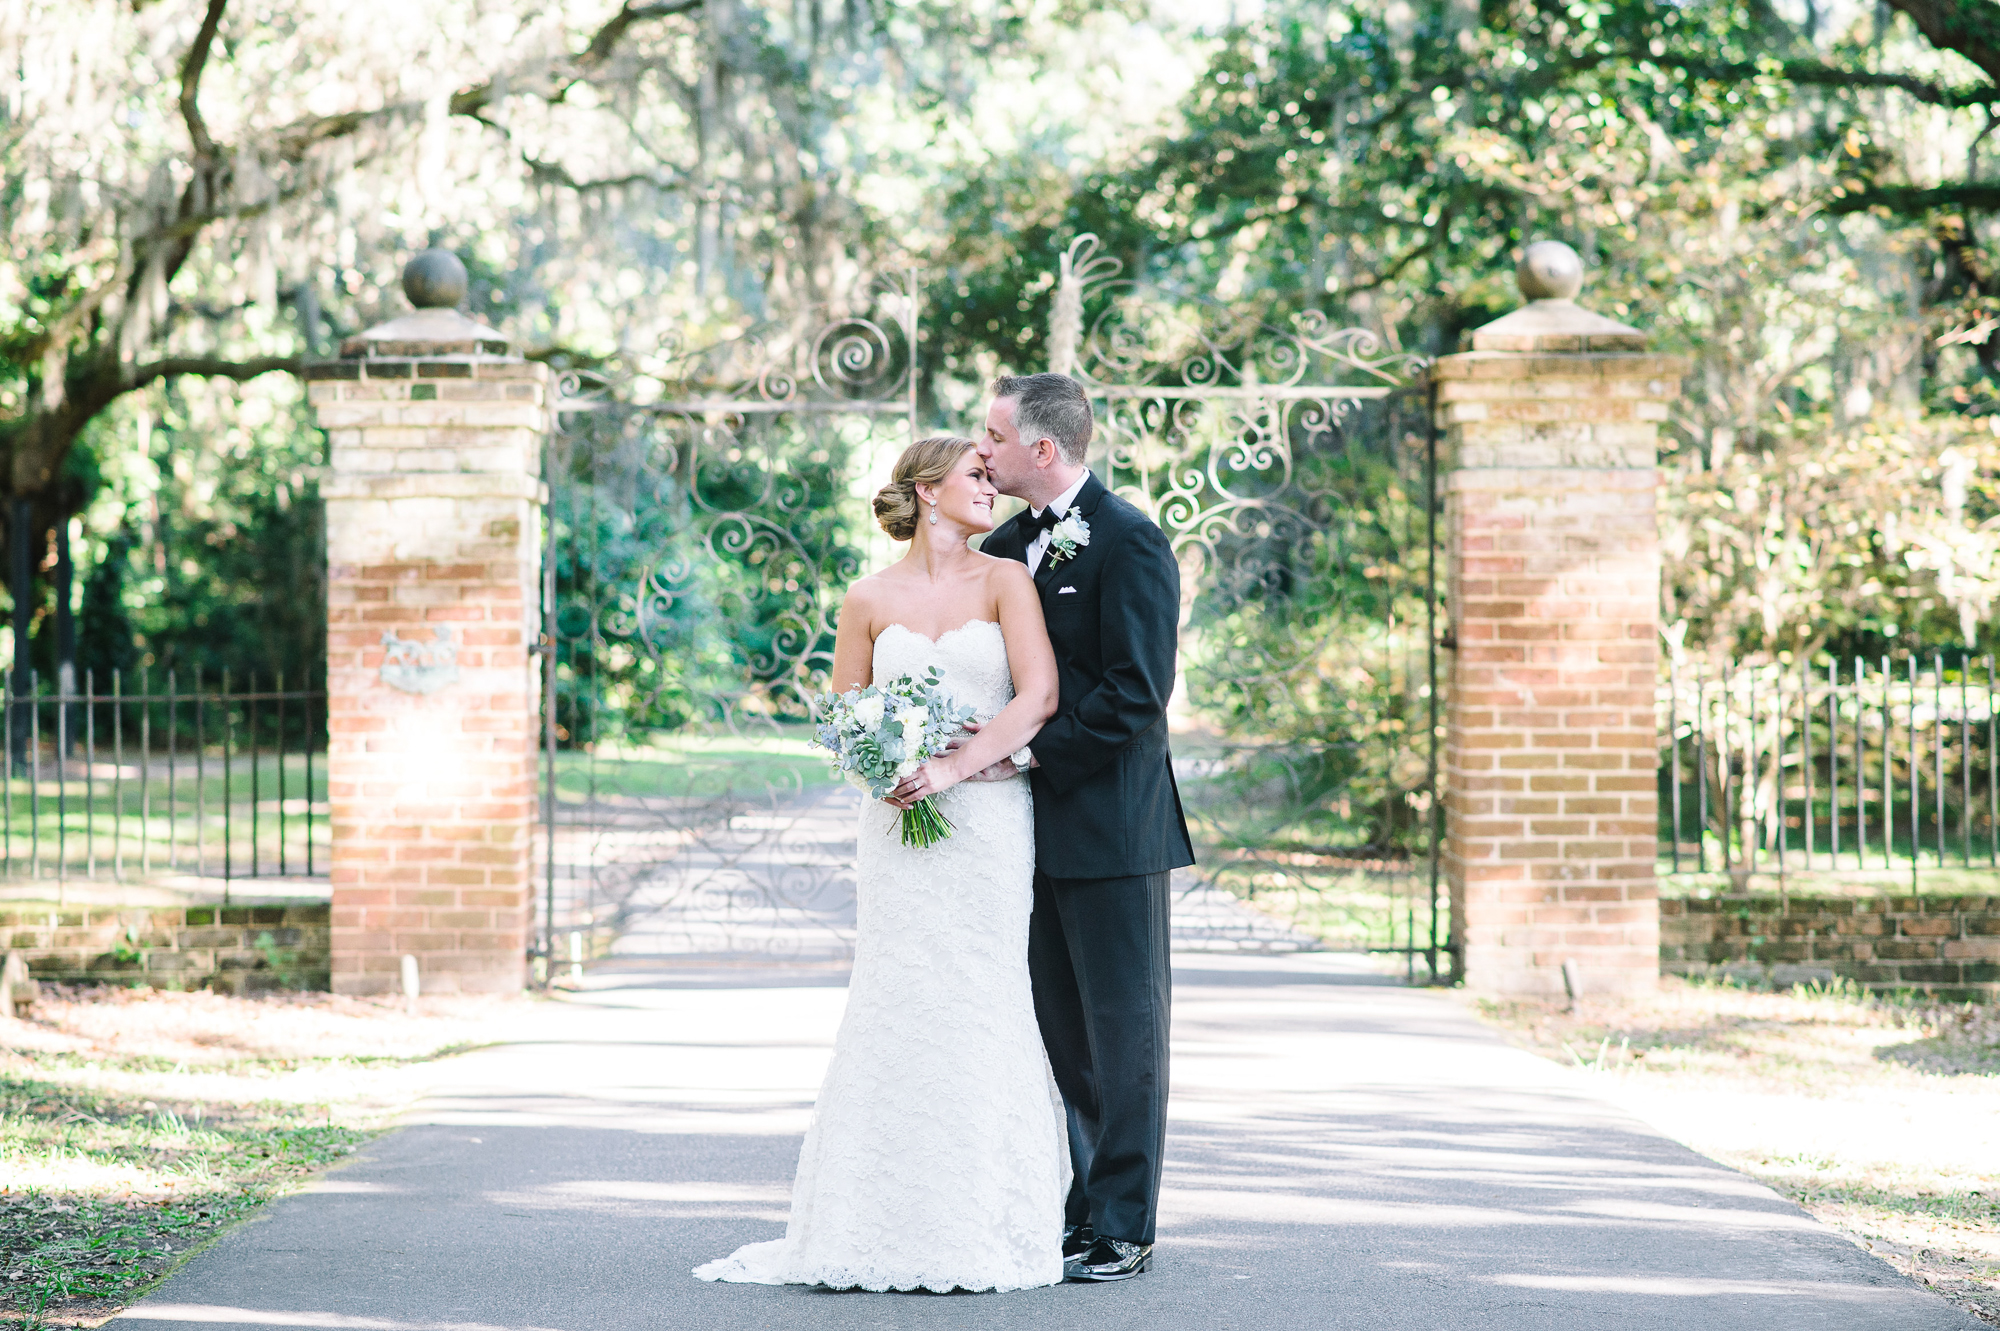 Legare Waring House wedding in Charleston, SC